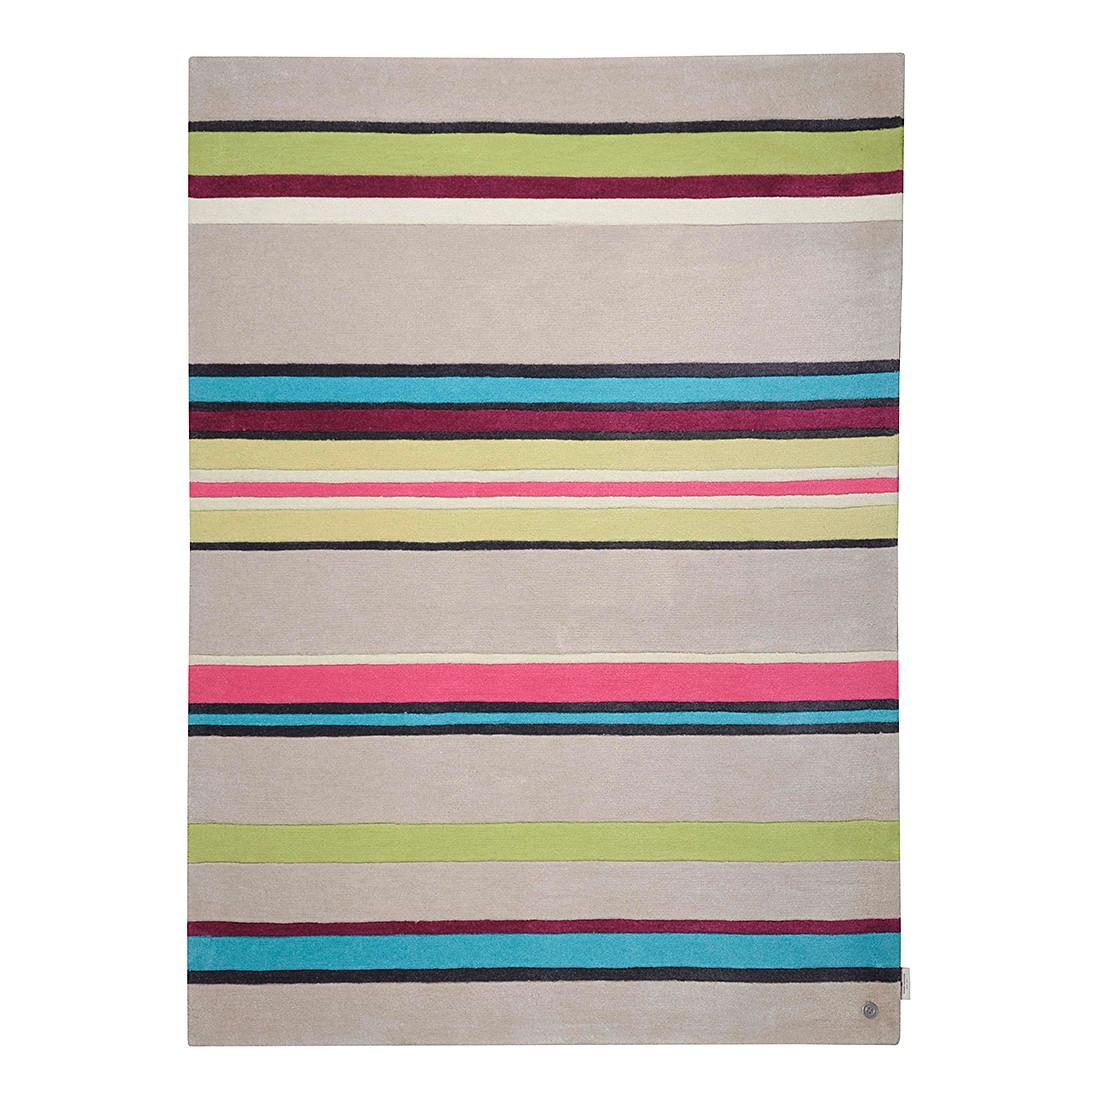 Teppich Life Stripes – Multicolor – Maße: 160 x 230 cm, Tom Tailor günstig online kaufen